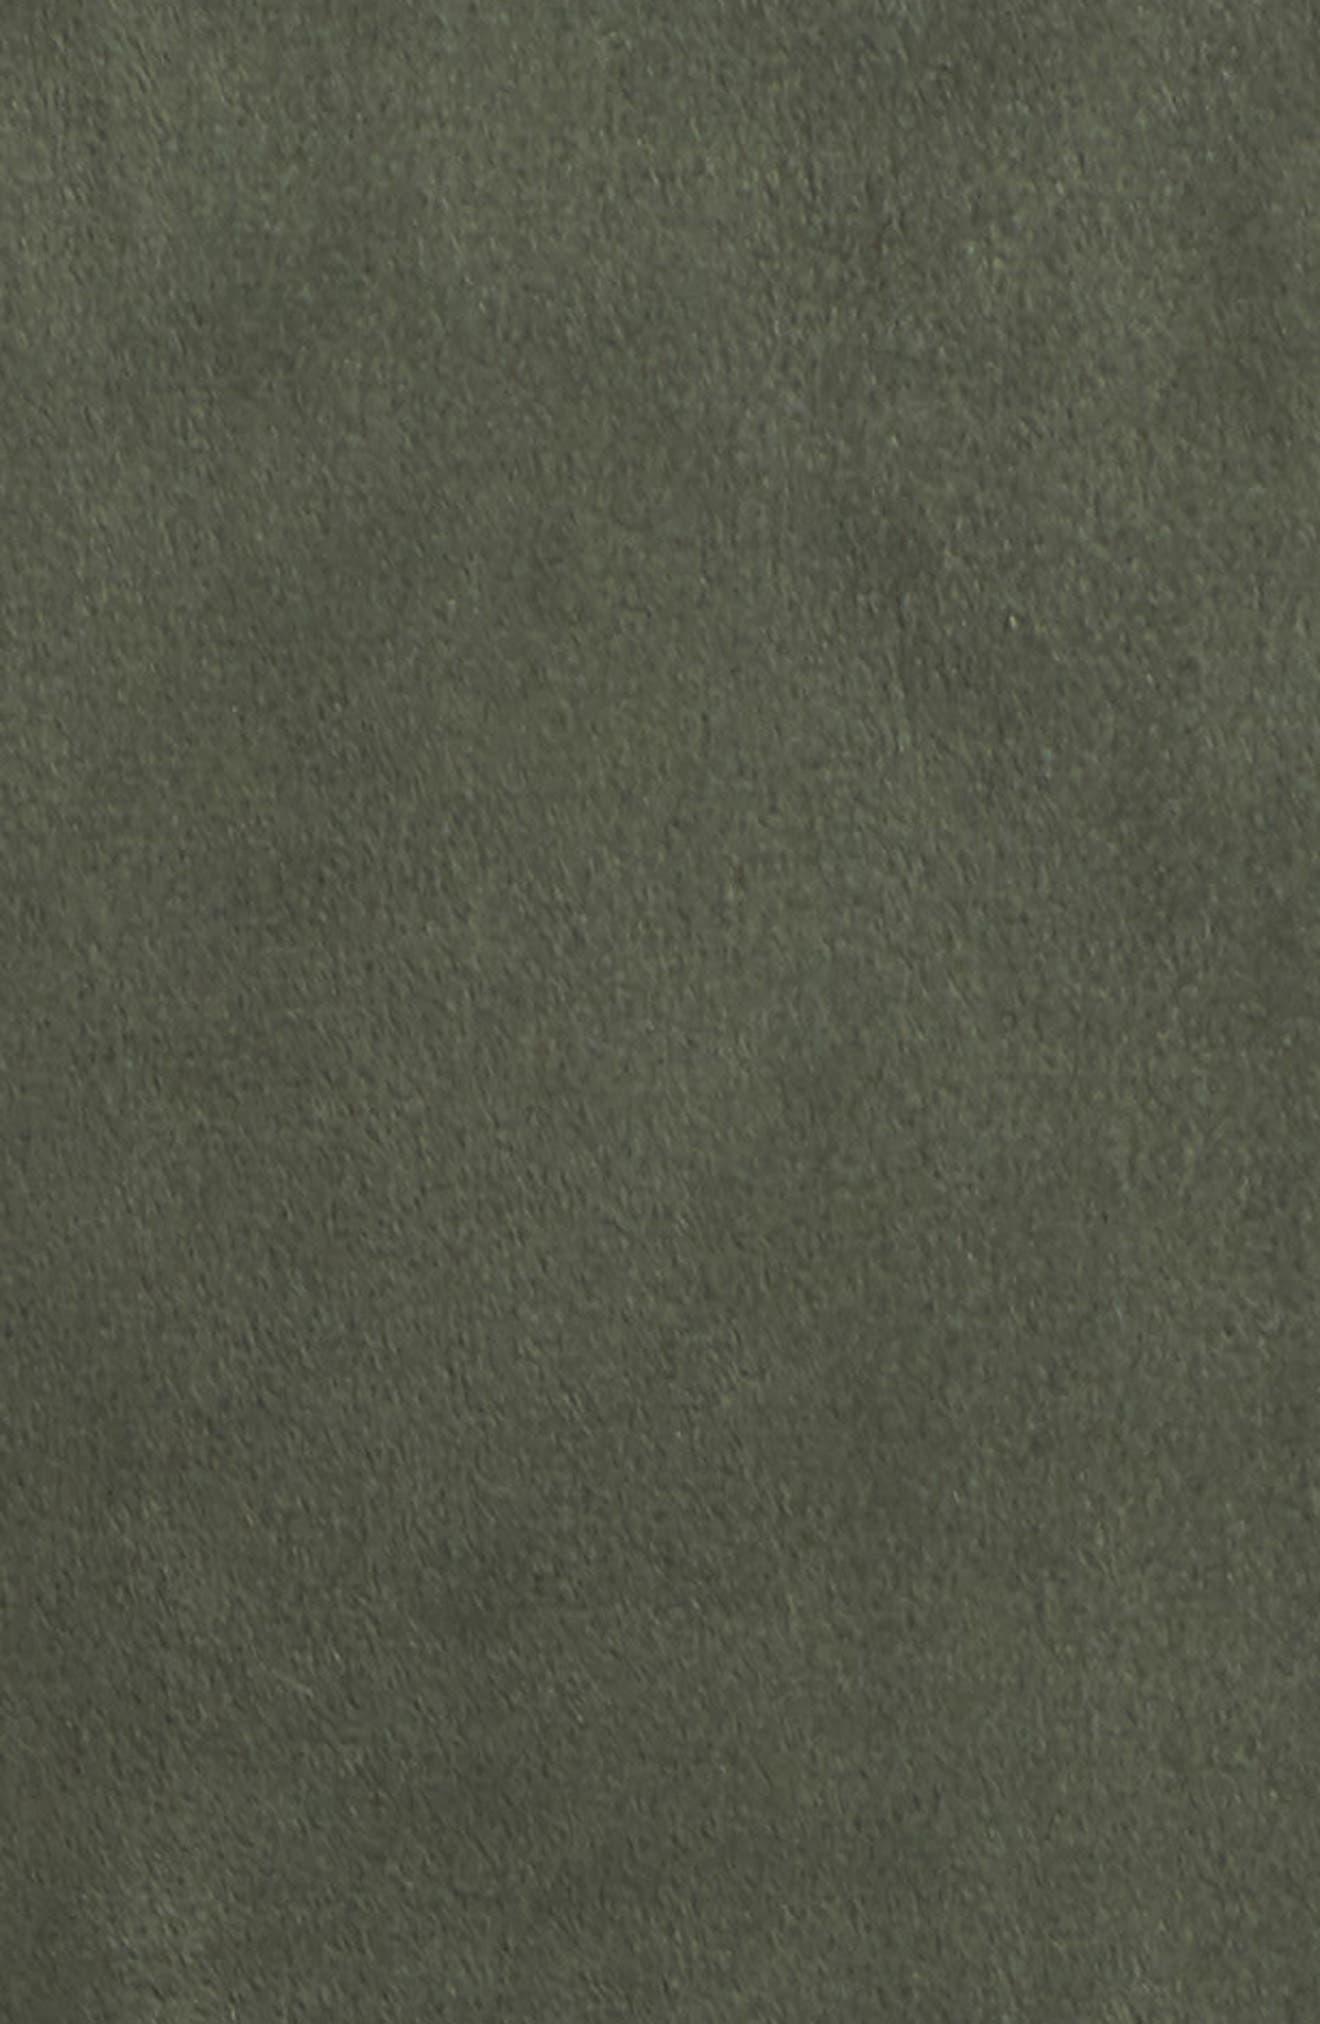 Originals Velvet Track Pants,                             Alternate thumbnail 6, color,                             300